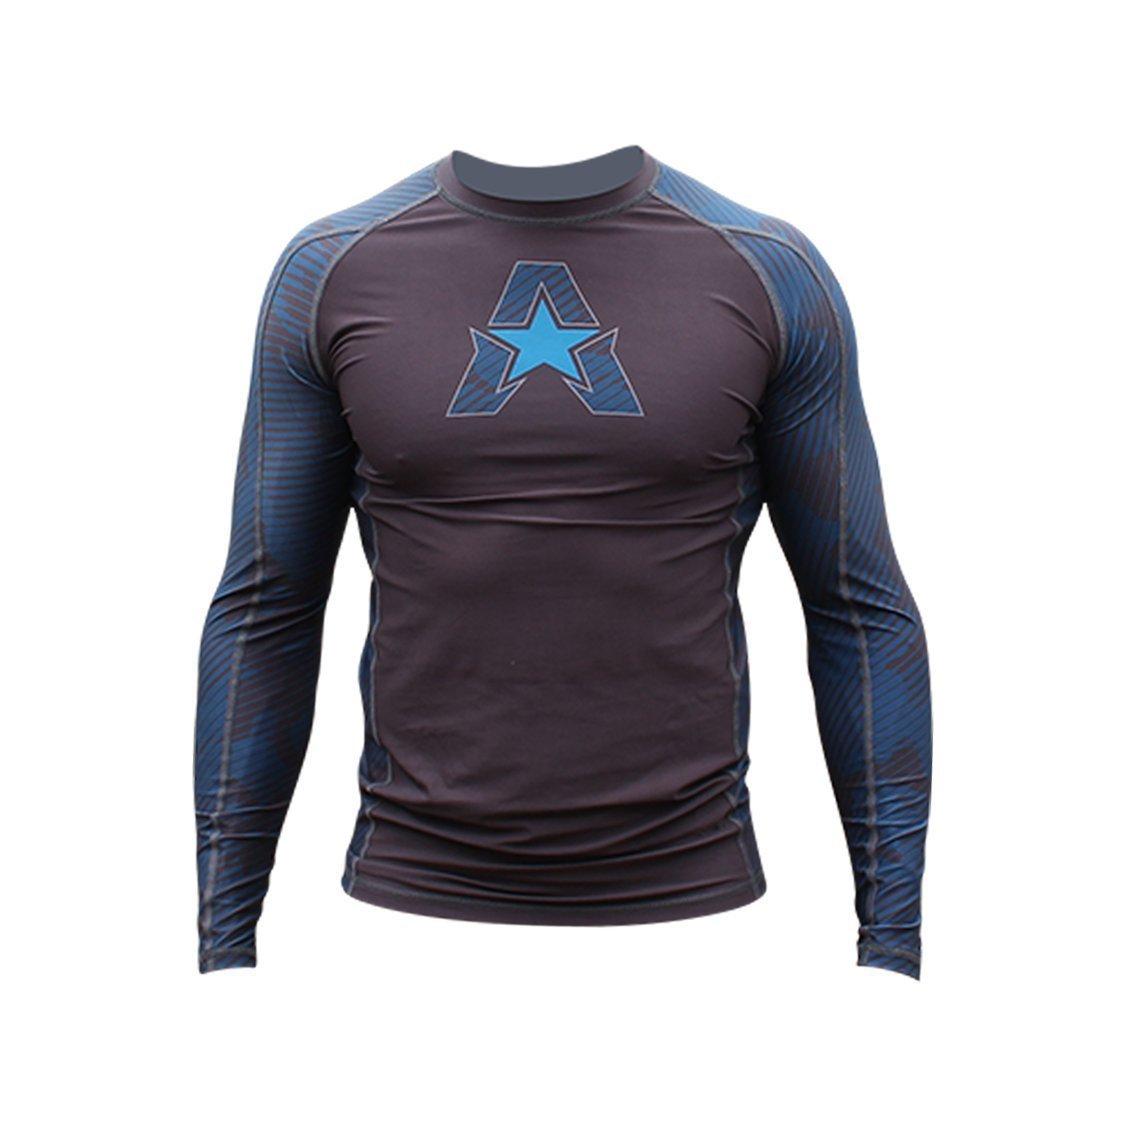 Anthem Athletics NEW! 10+ Styles HELO-X Long Sleeve Rash Guard Compression Shirt - BJJ, MMA, Muay Thai - Marine Line Camo - X-Large